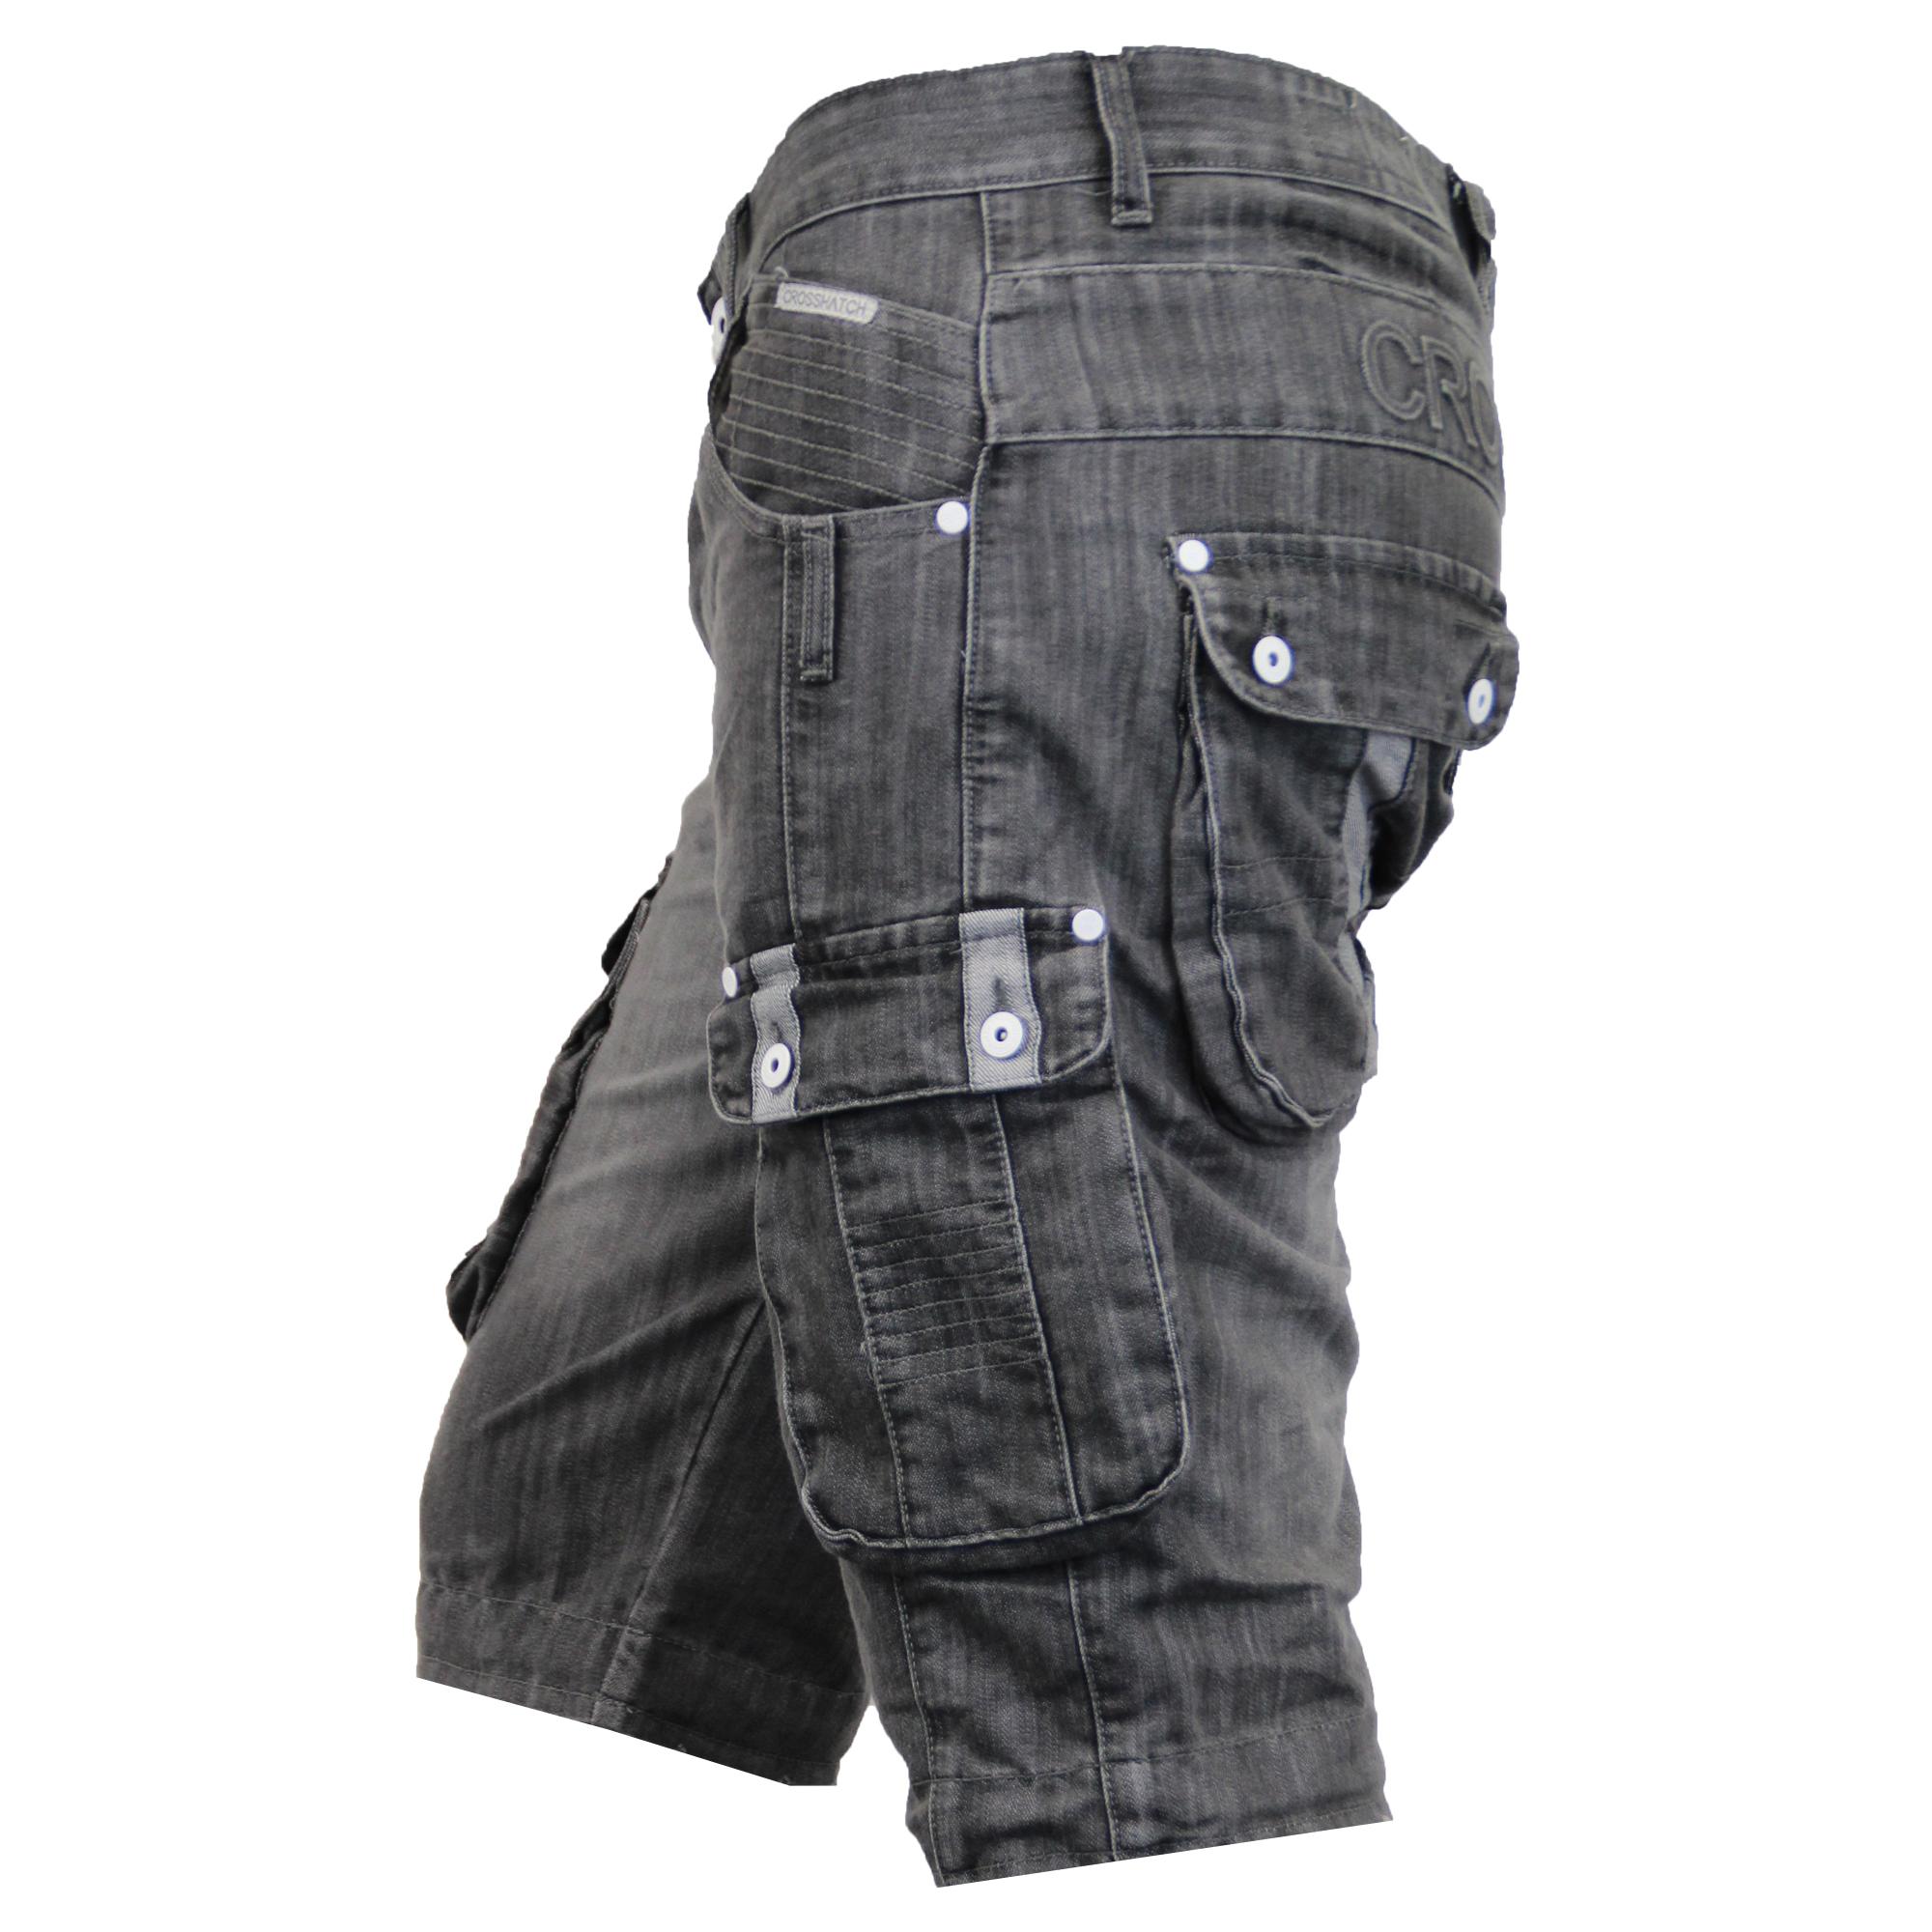 Mens-Denim-Knee-Length-Combat-Shorts-By-Crosshatch thumbnail 9